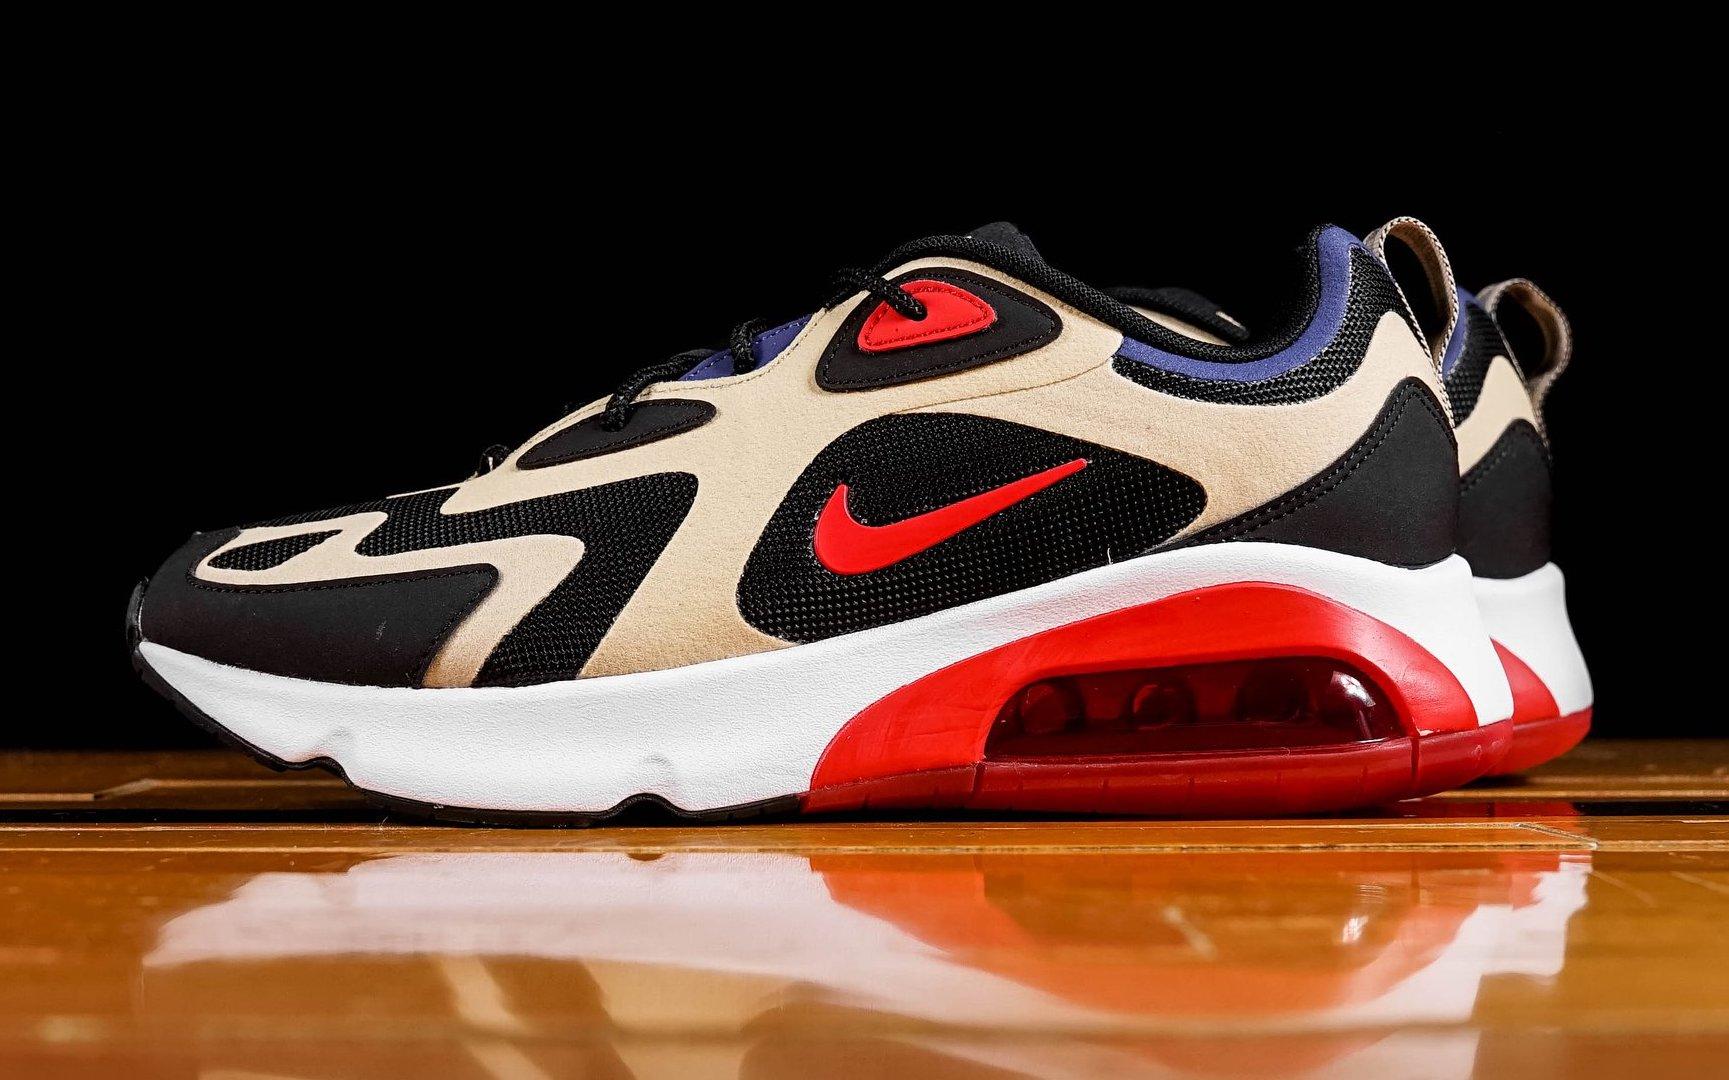 Nike Air Max 200 Team GoldUniversity Red | HYPEBEAST